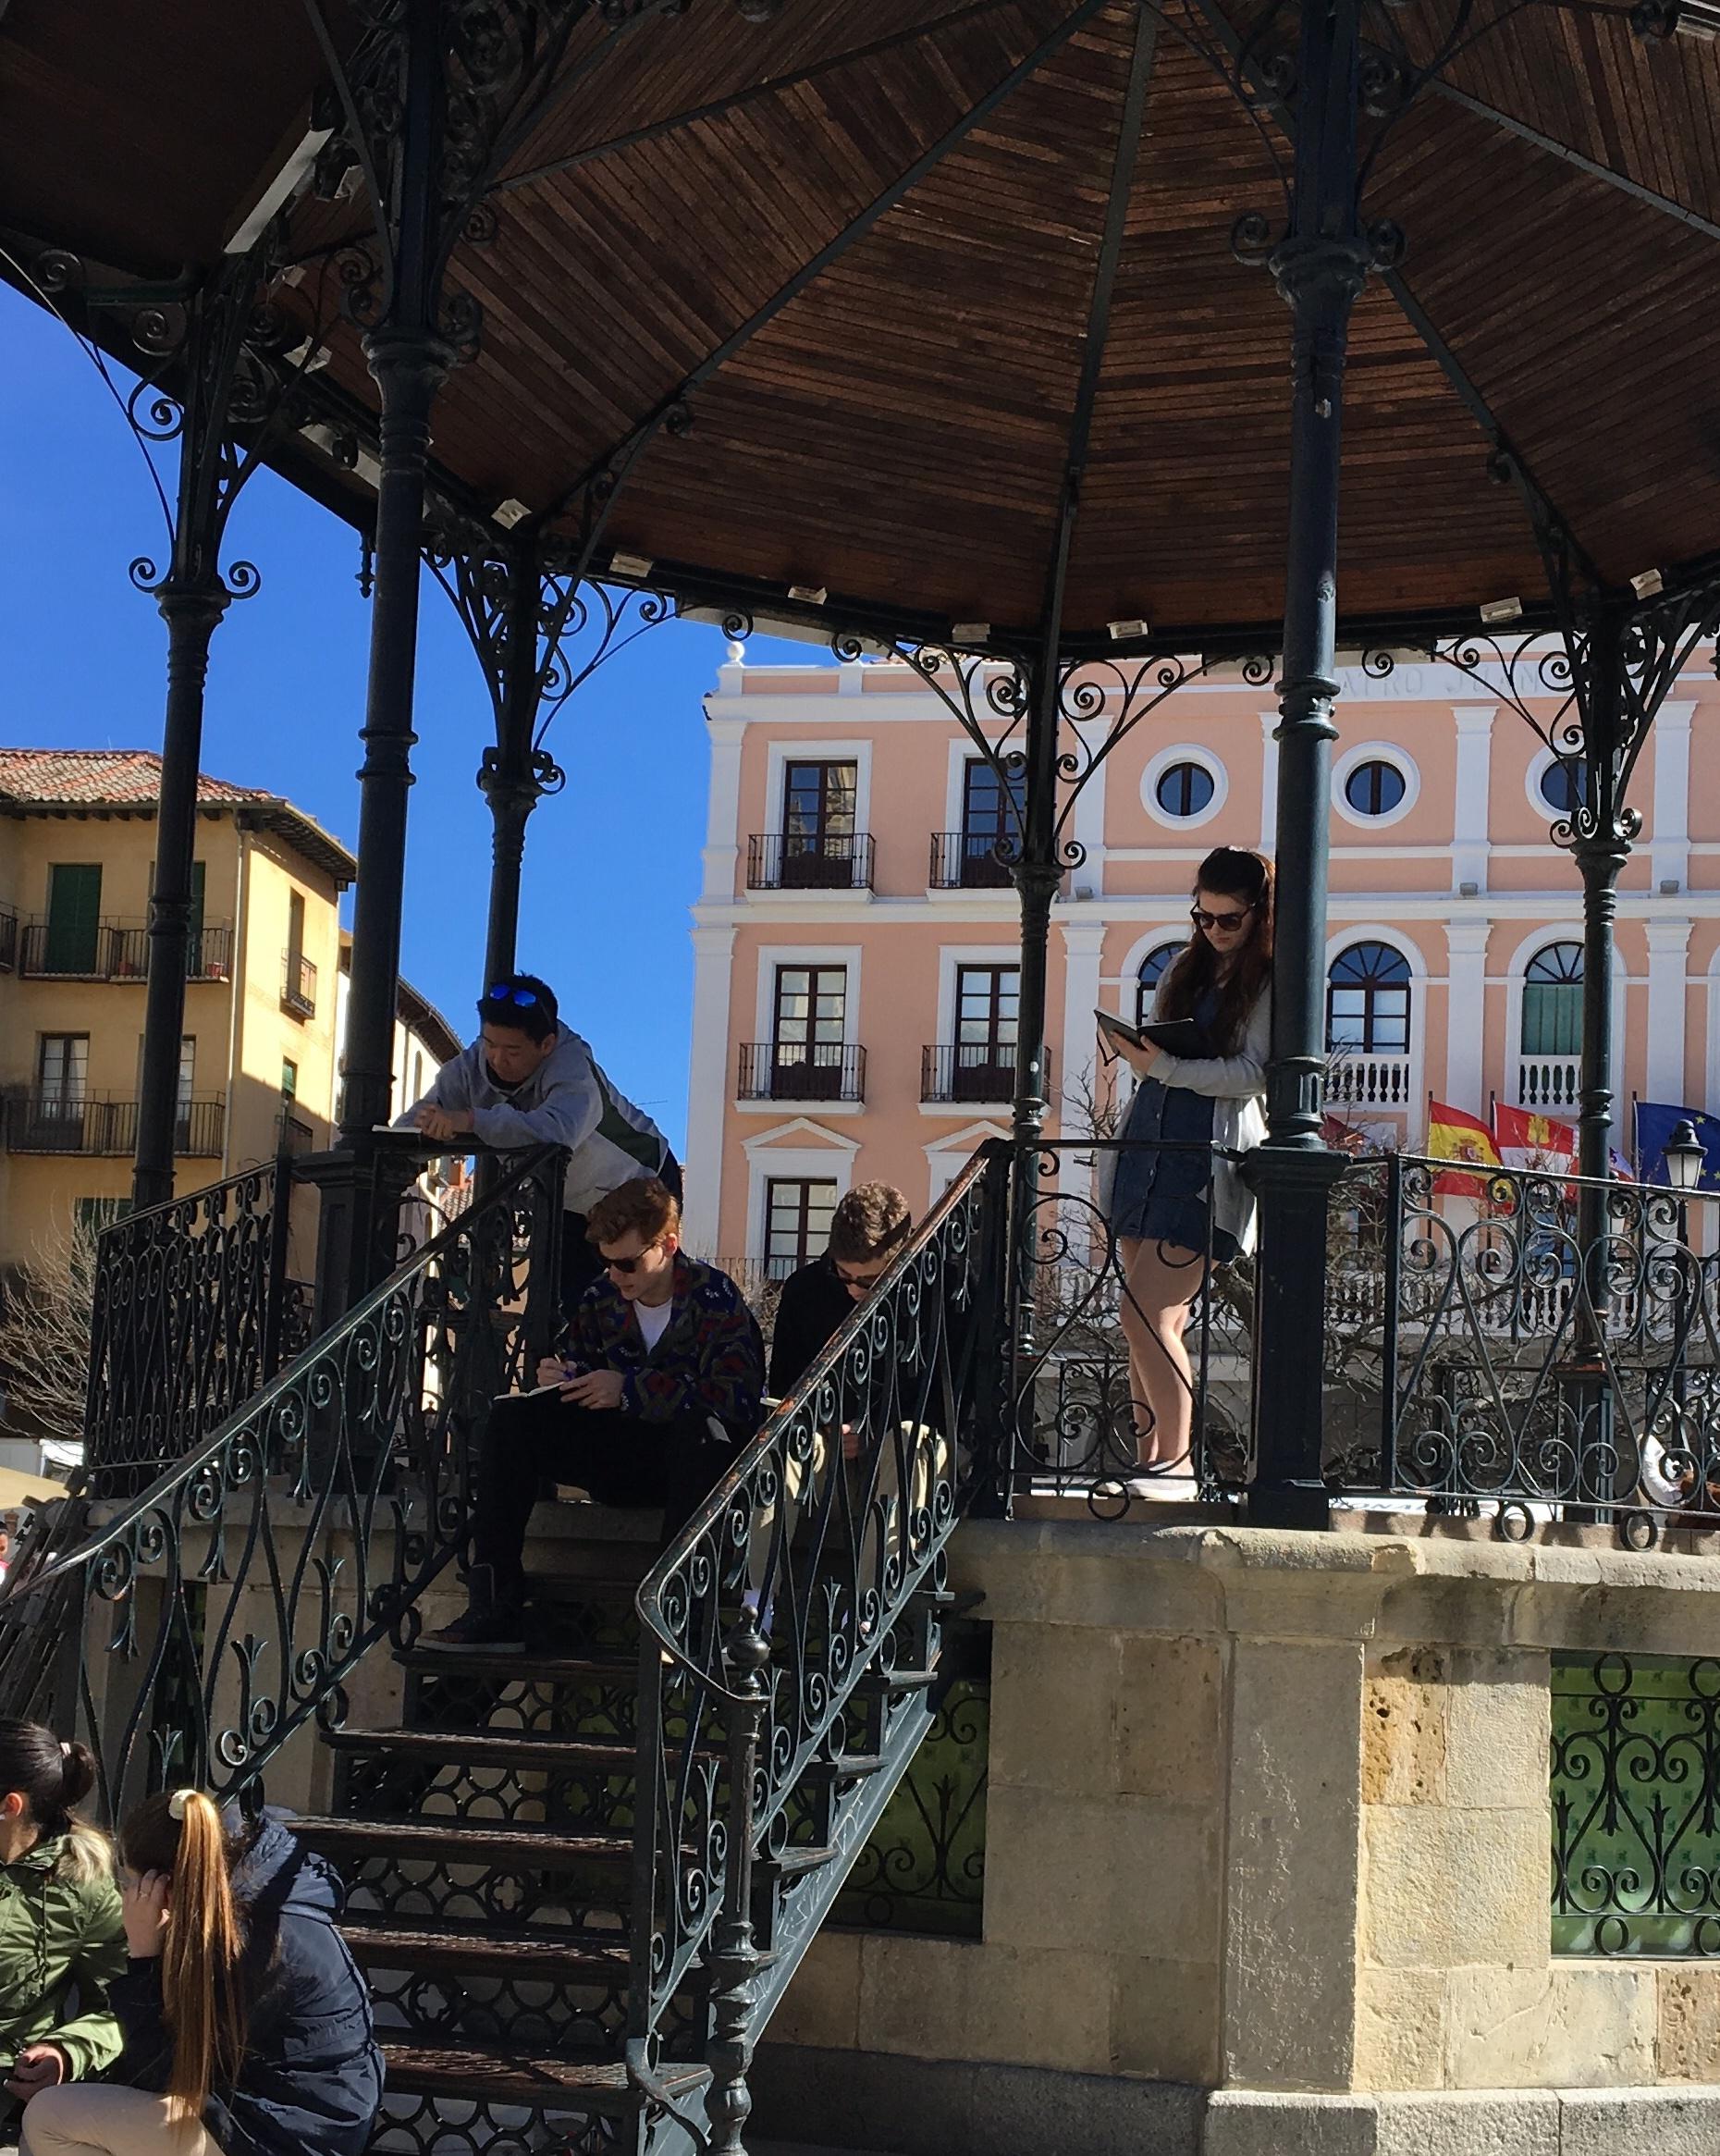 Proctor en Segovia writes in the Plaza Mayor